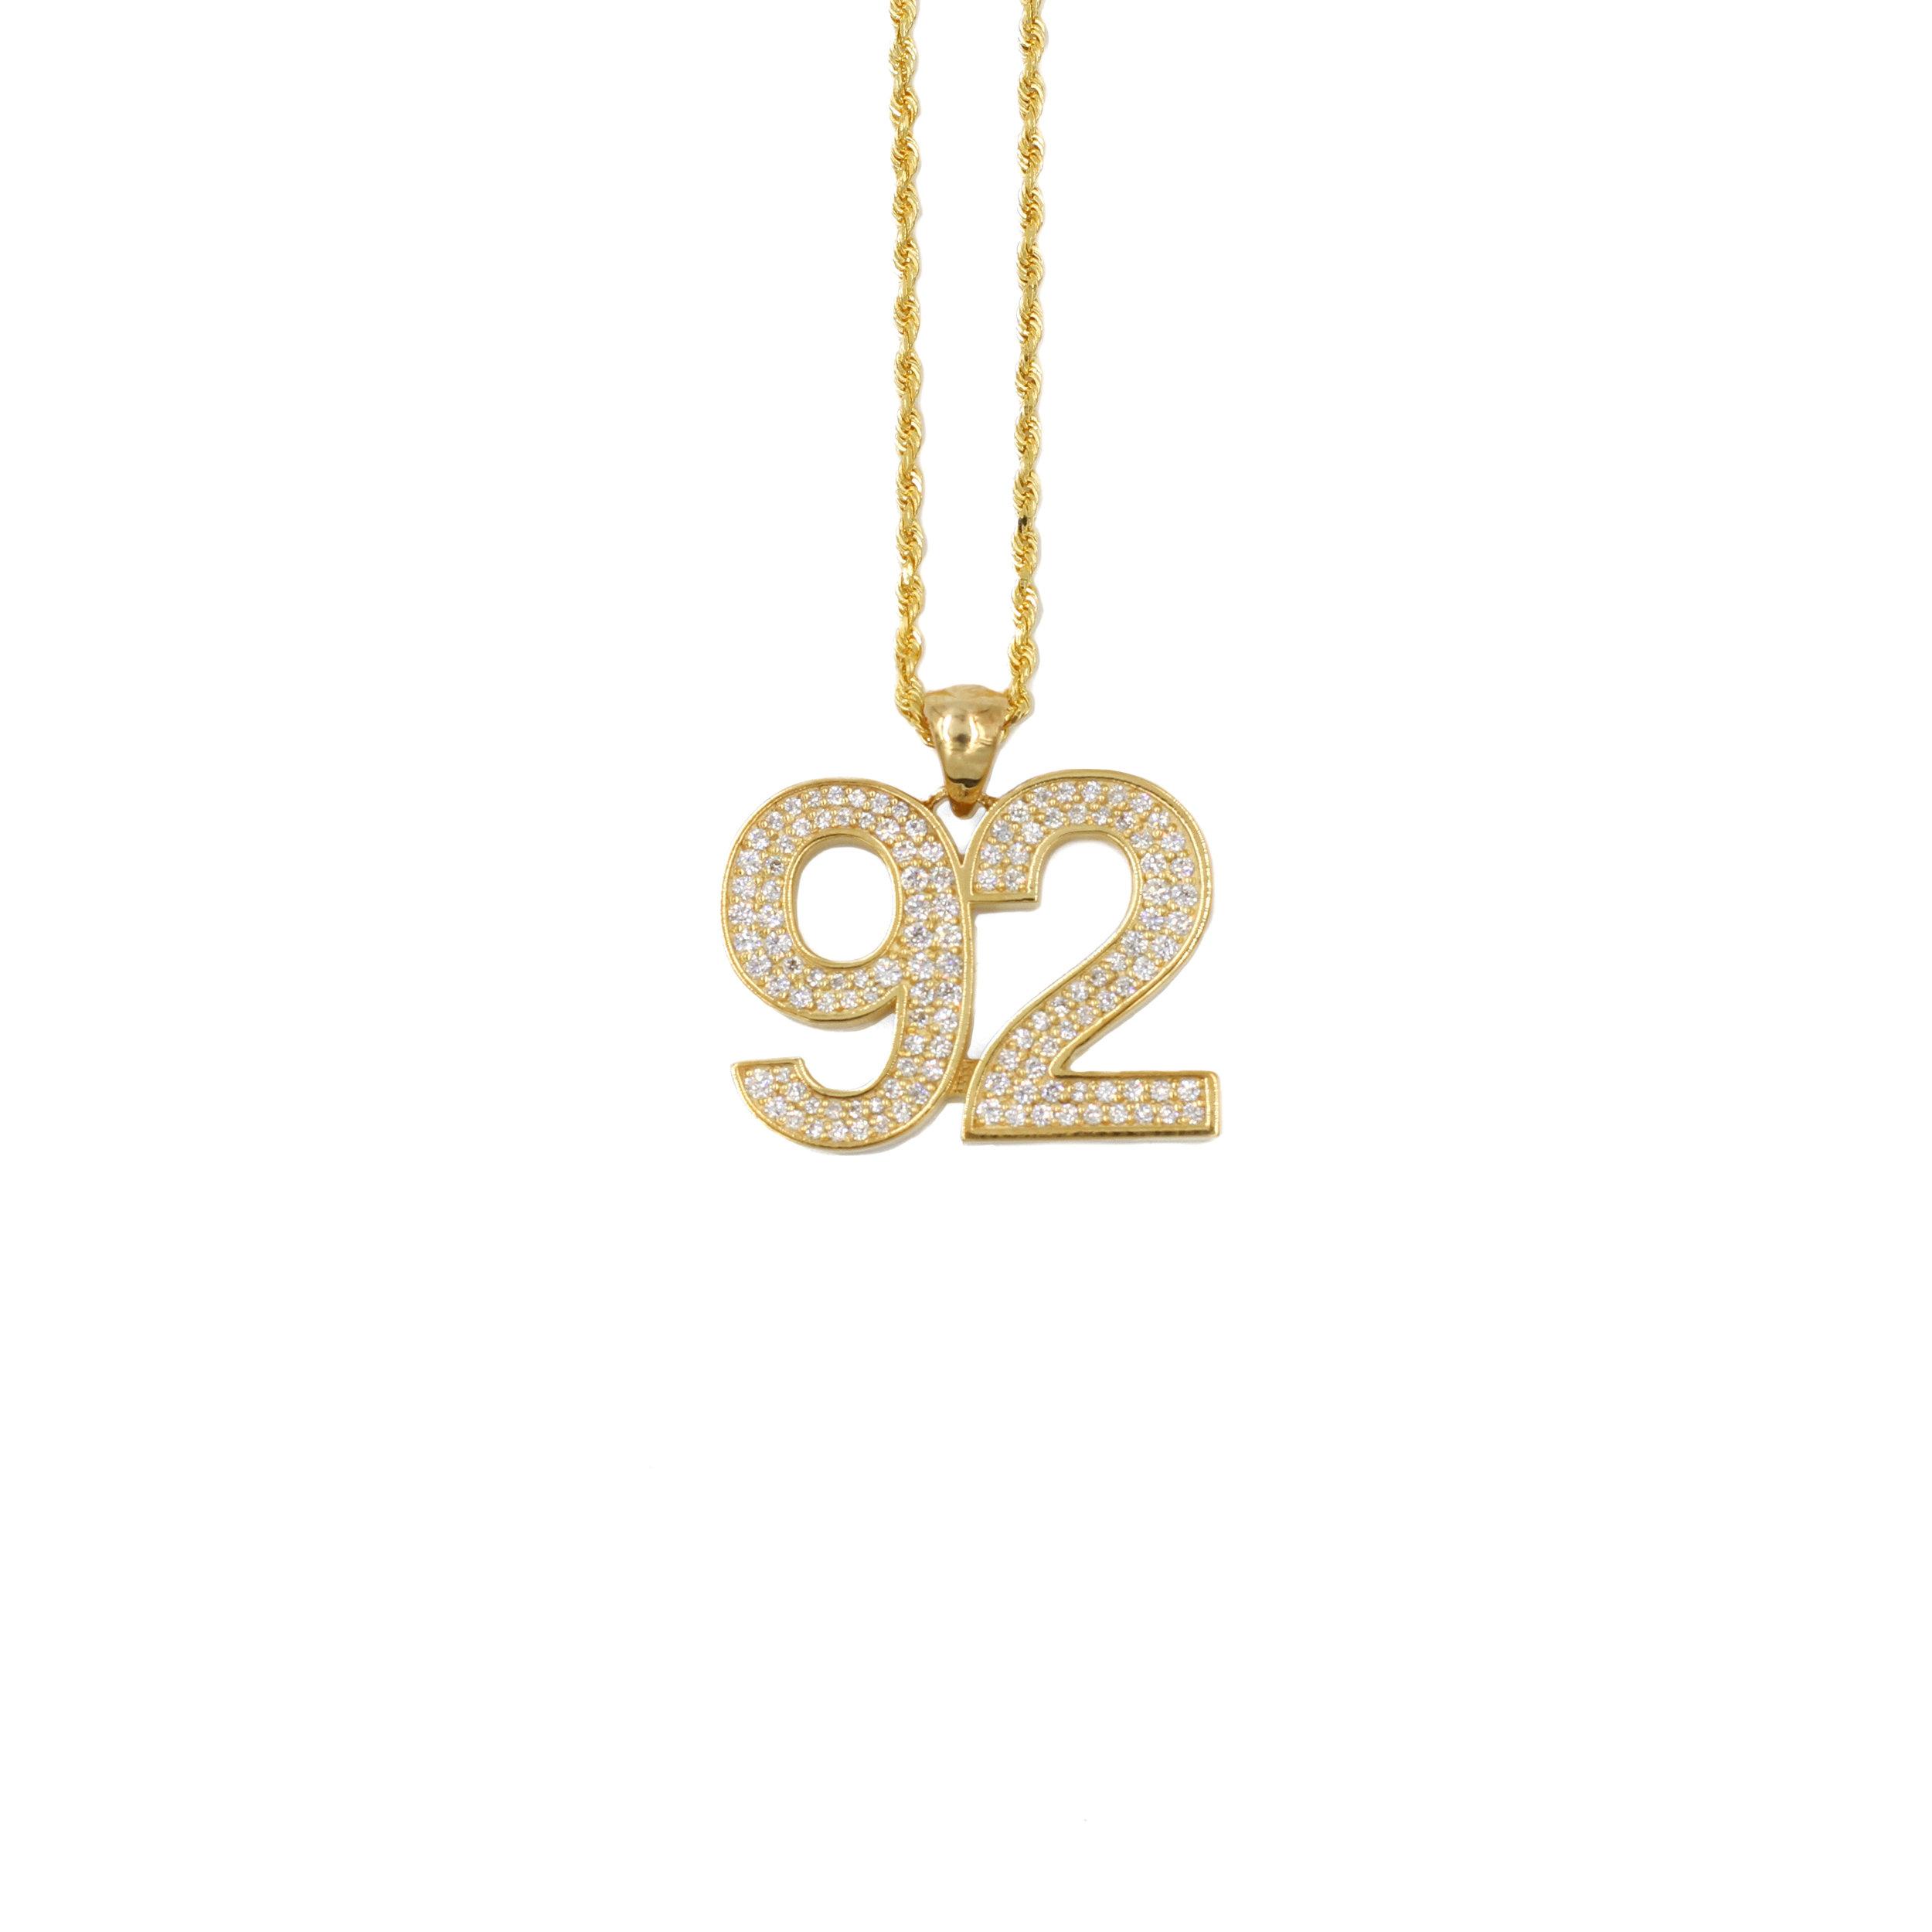 92 Diamond Pendant